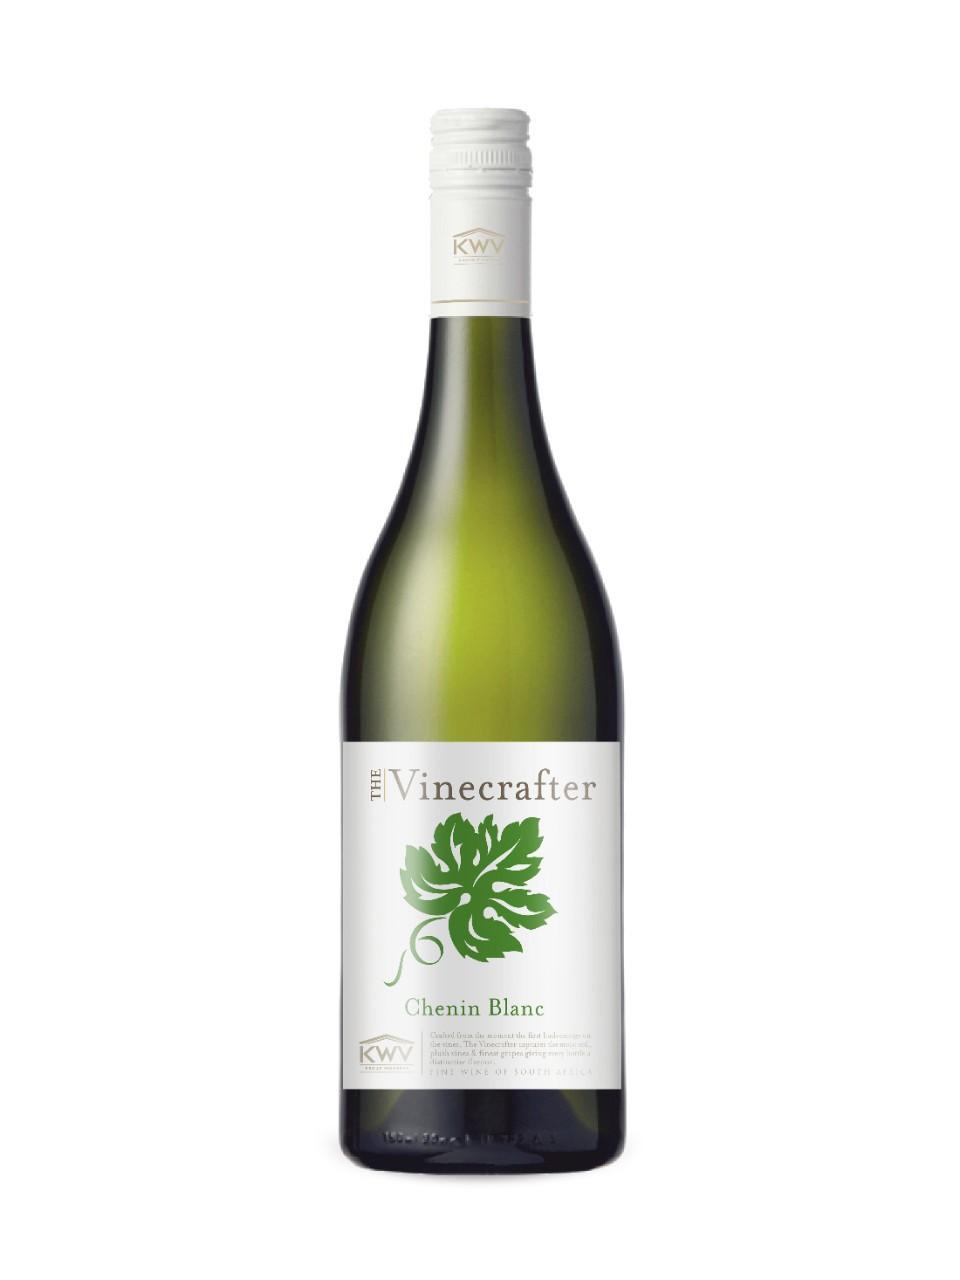 The vinecrafter chenin blanc lcbo for Chenin blanc